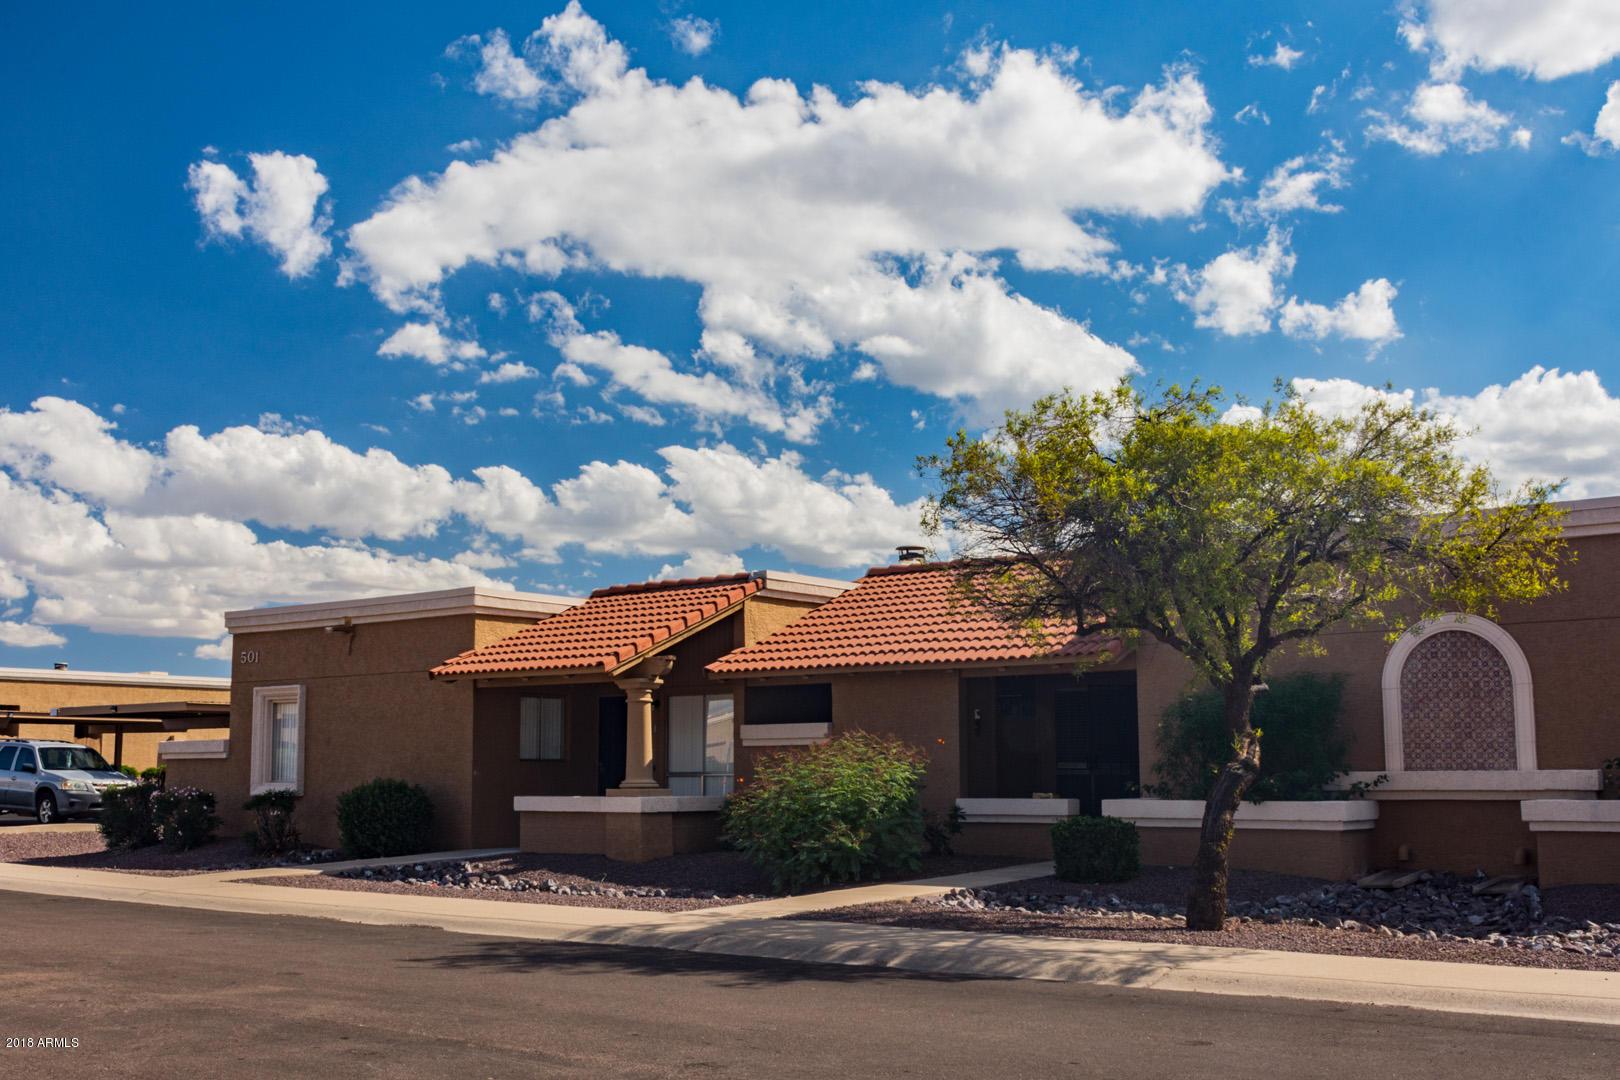 Photo of 501 W HONONEGH Drive #1, Phoenix, AZ 85027